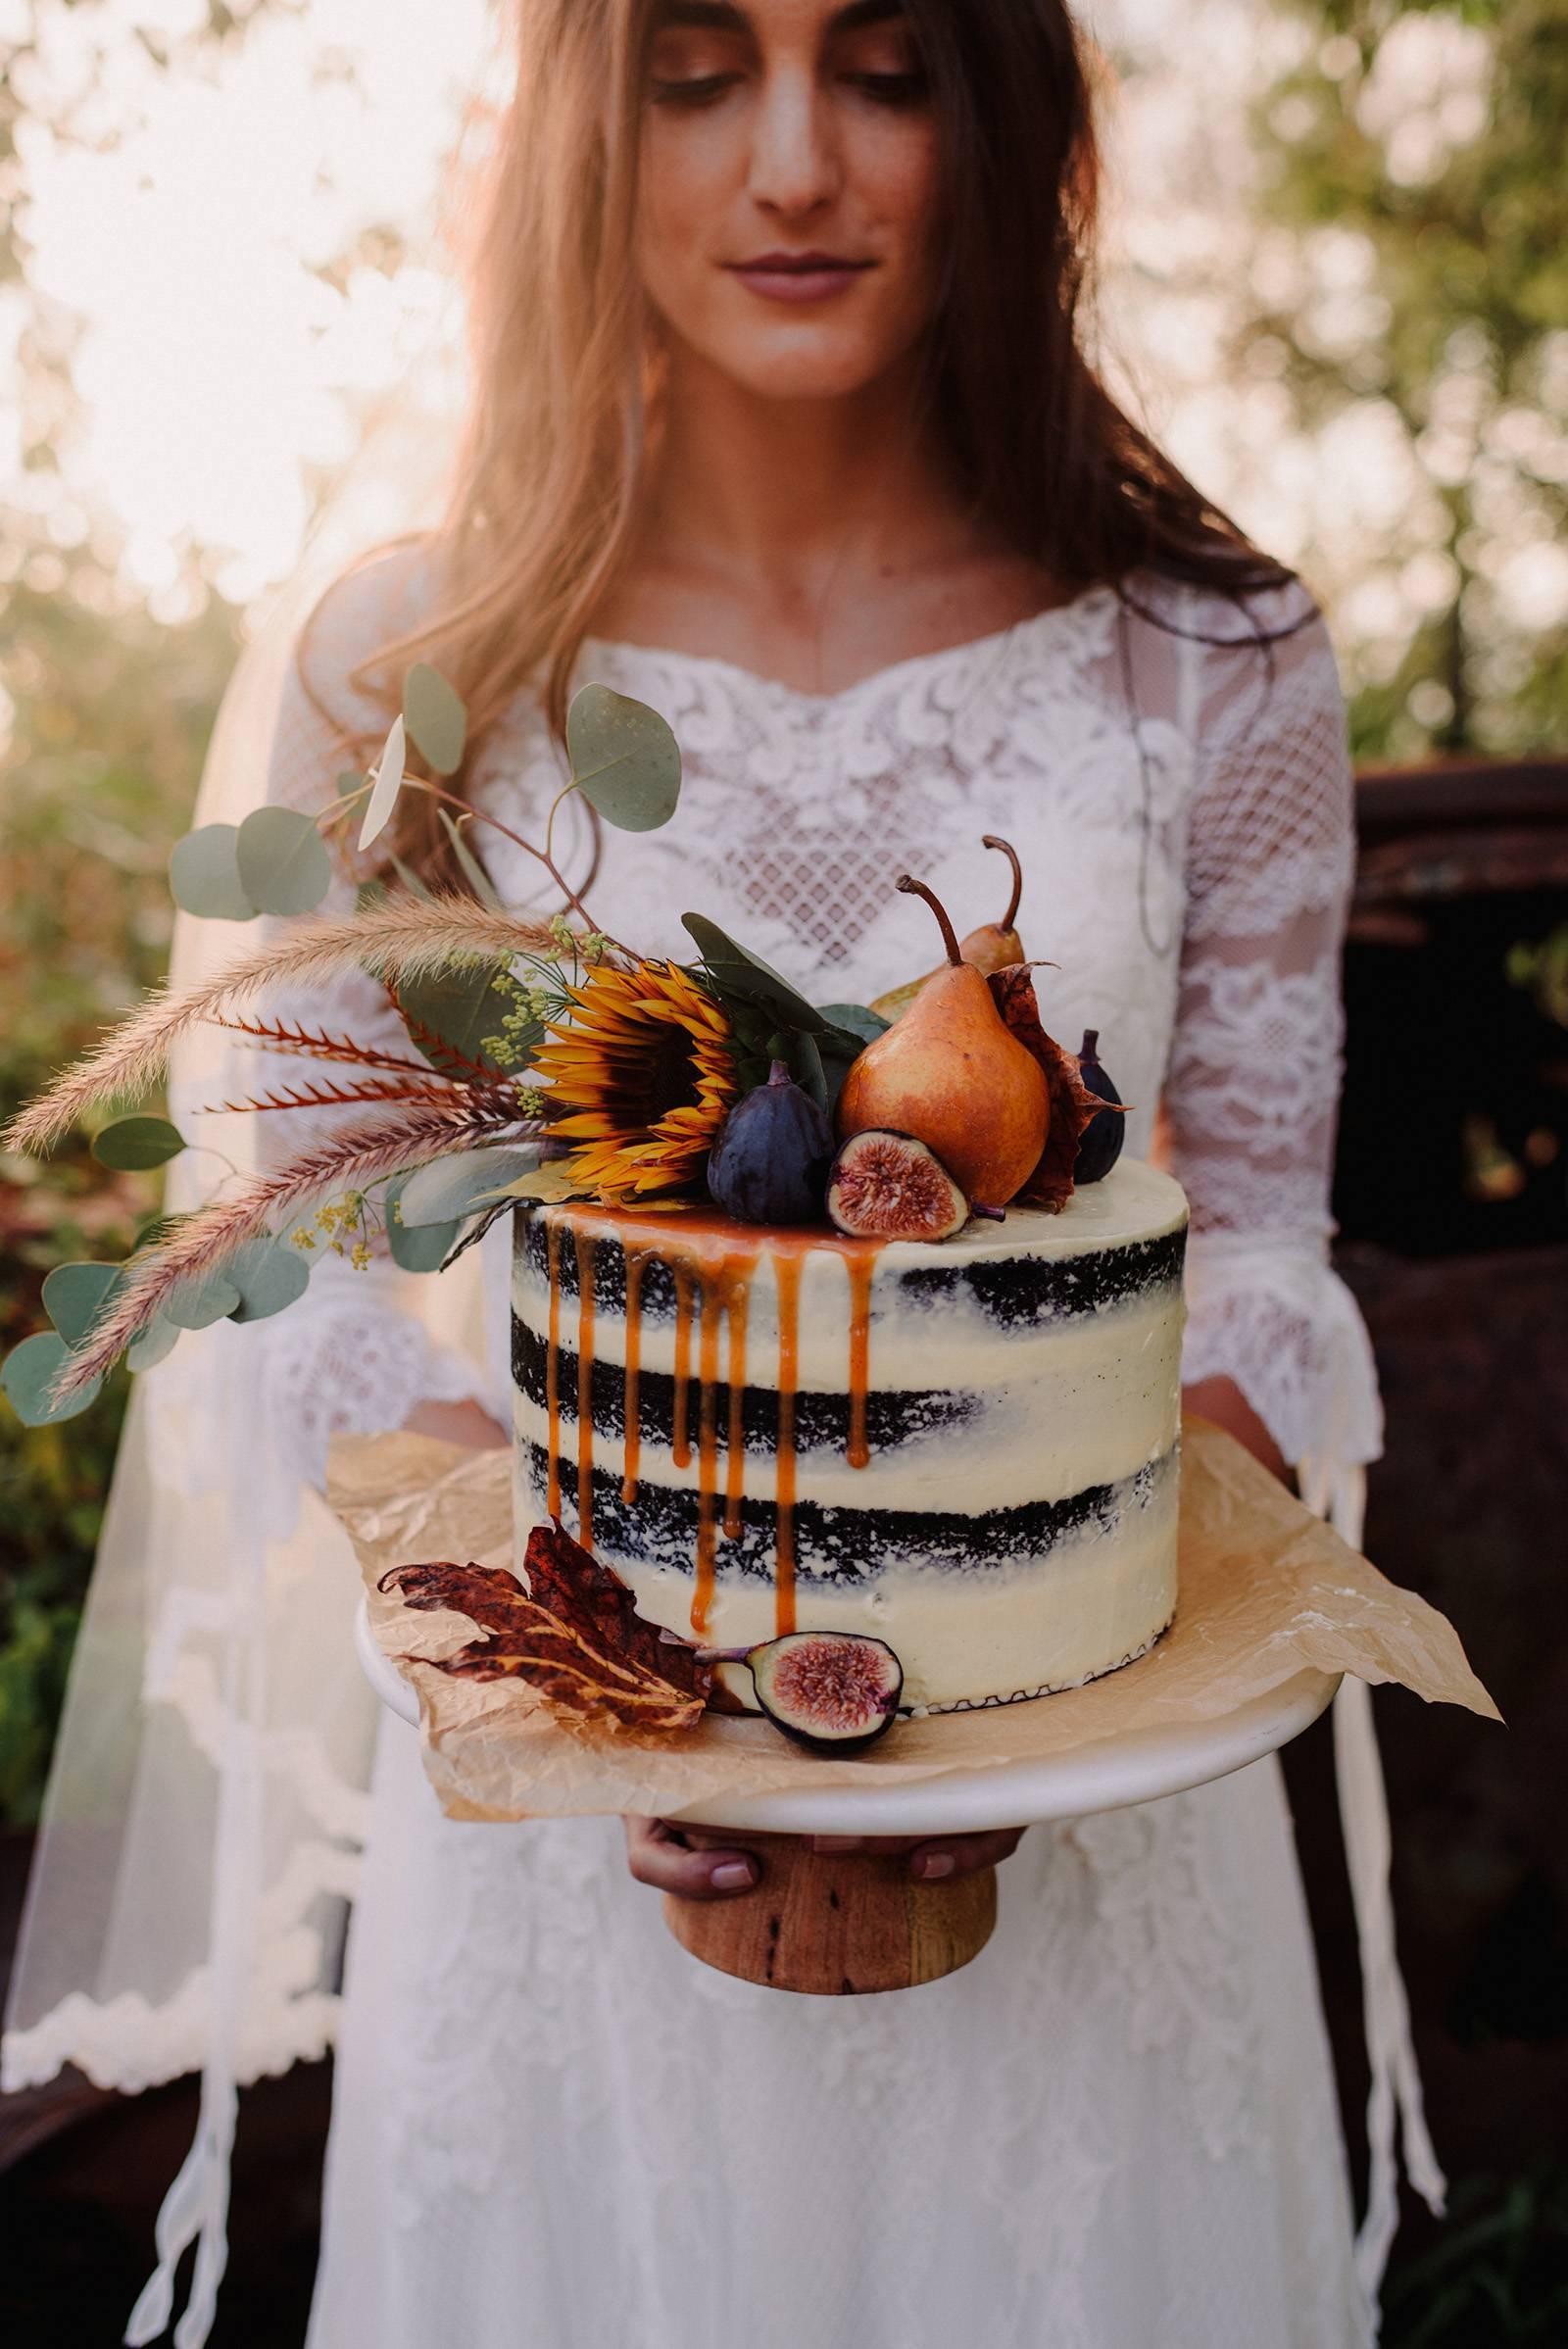 Bruid met naakte bruidstaart